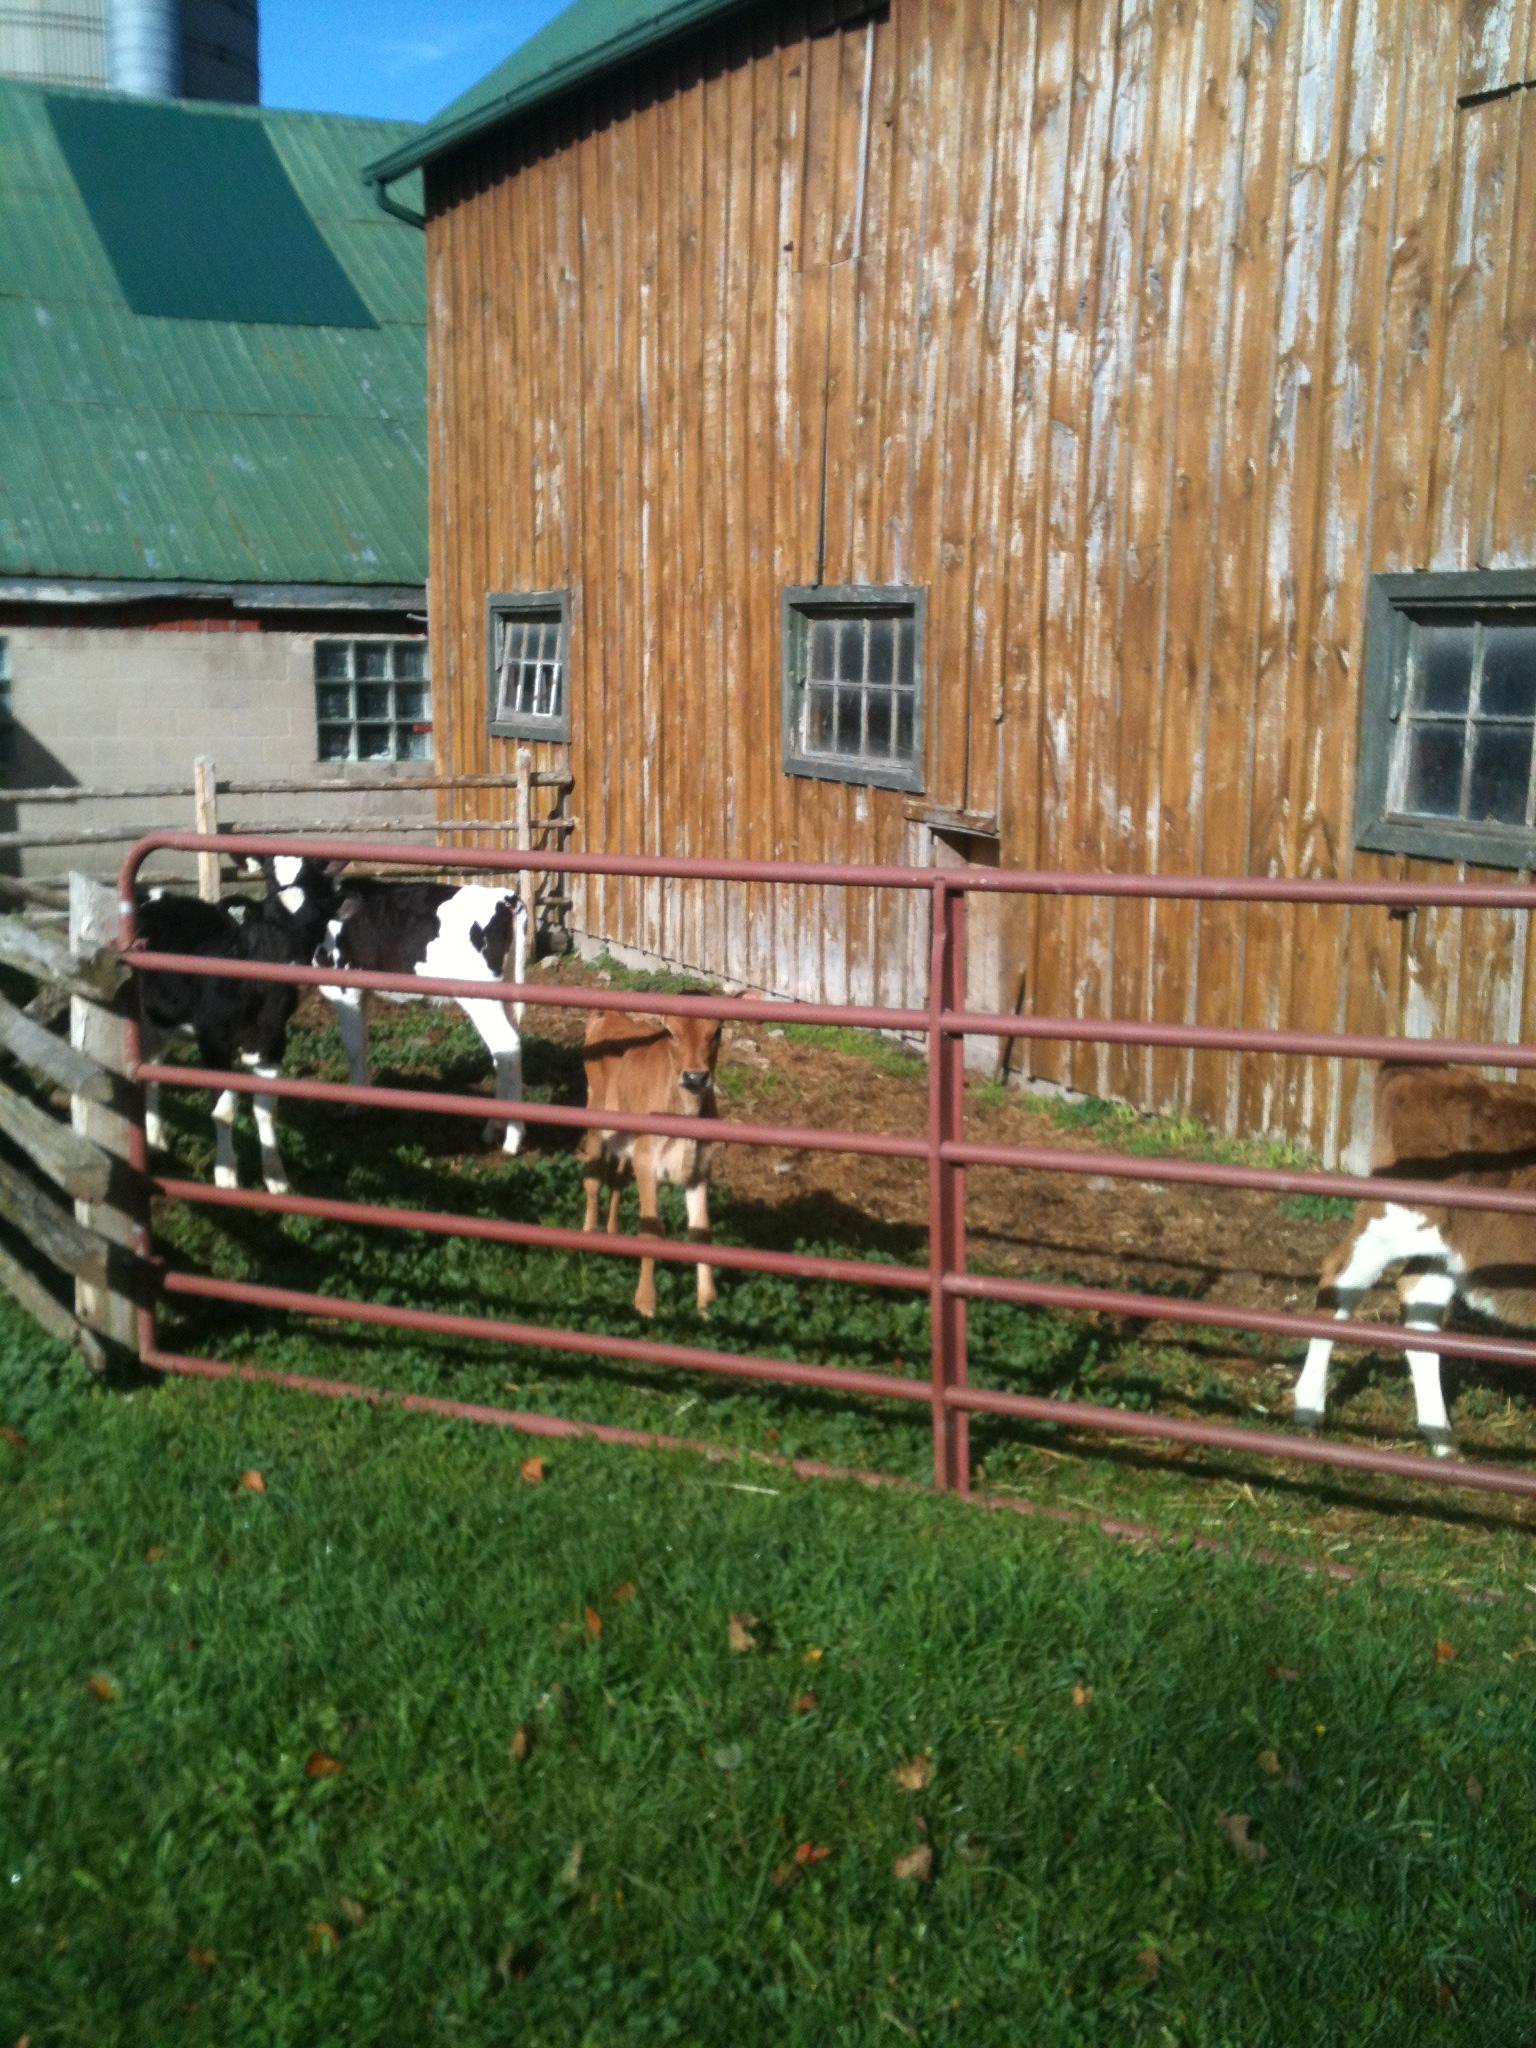 Calves enjoying the sunshine